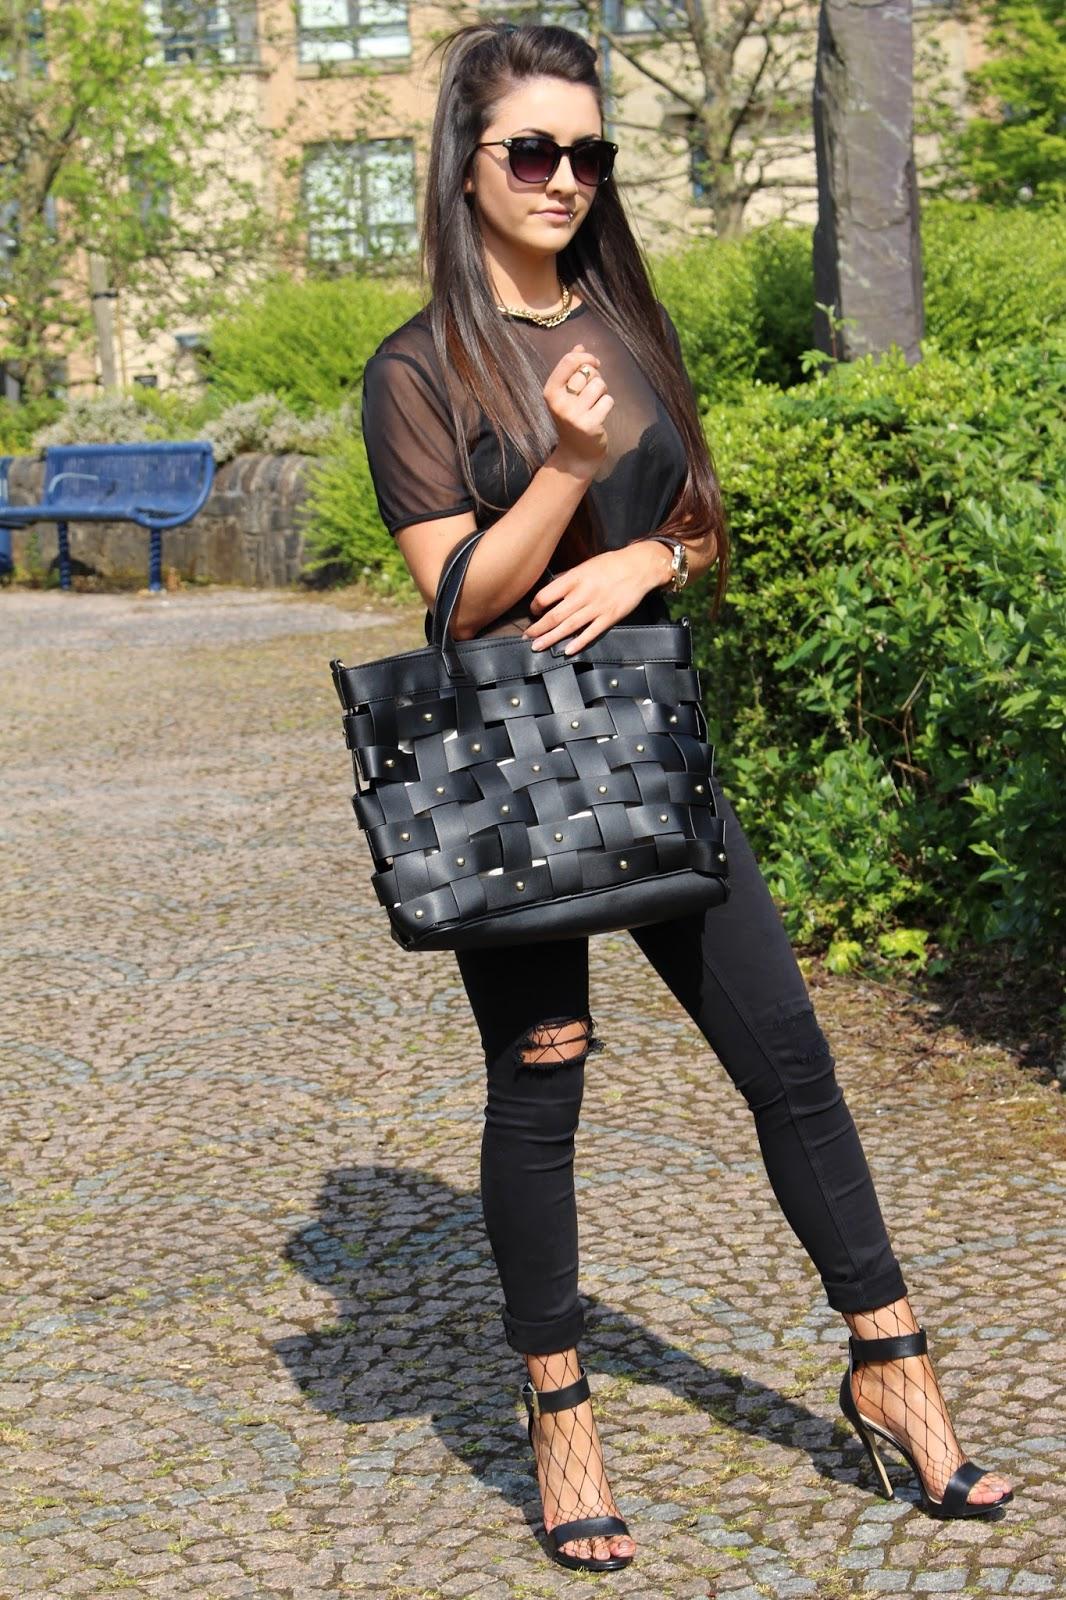 Fashion Mia Online Customer Reviews: Her Fastest Fashion